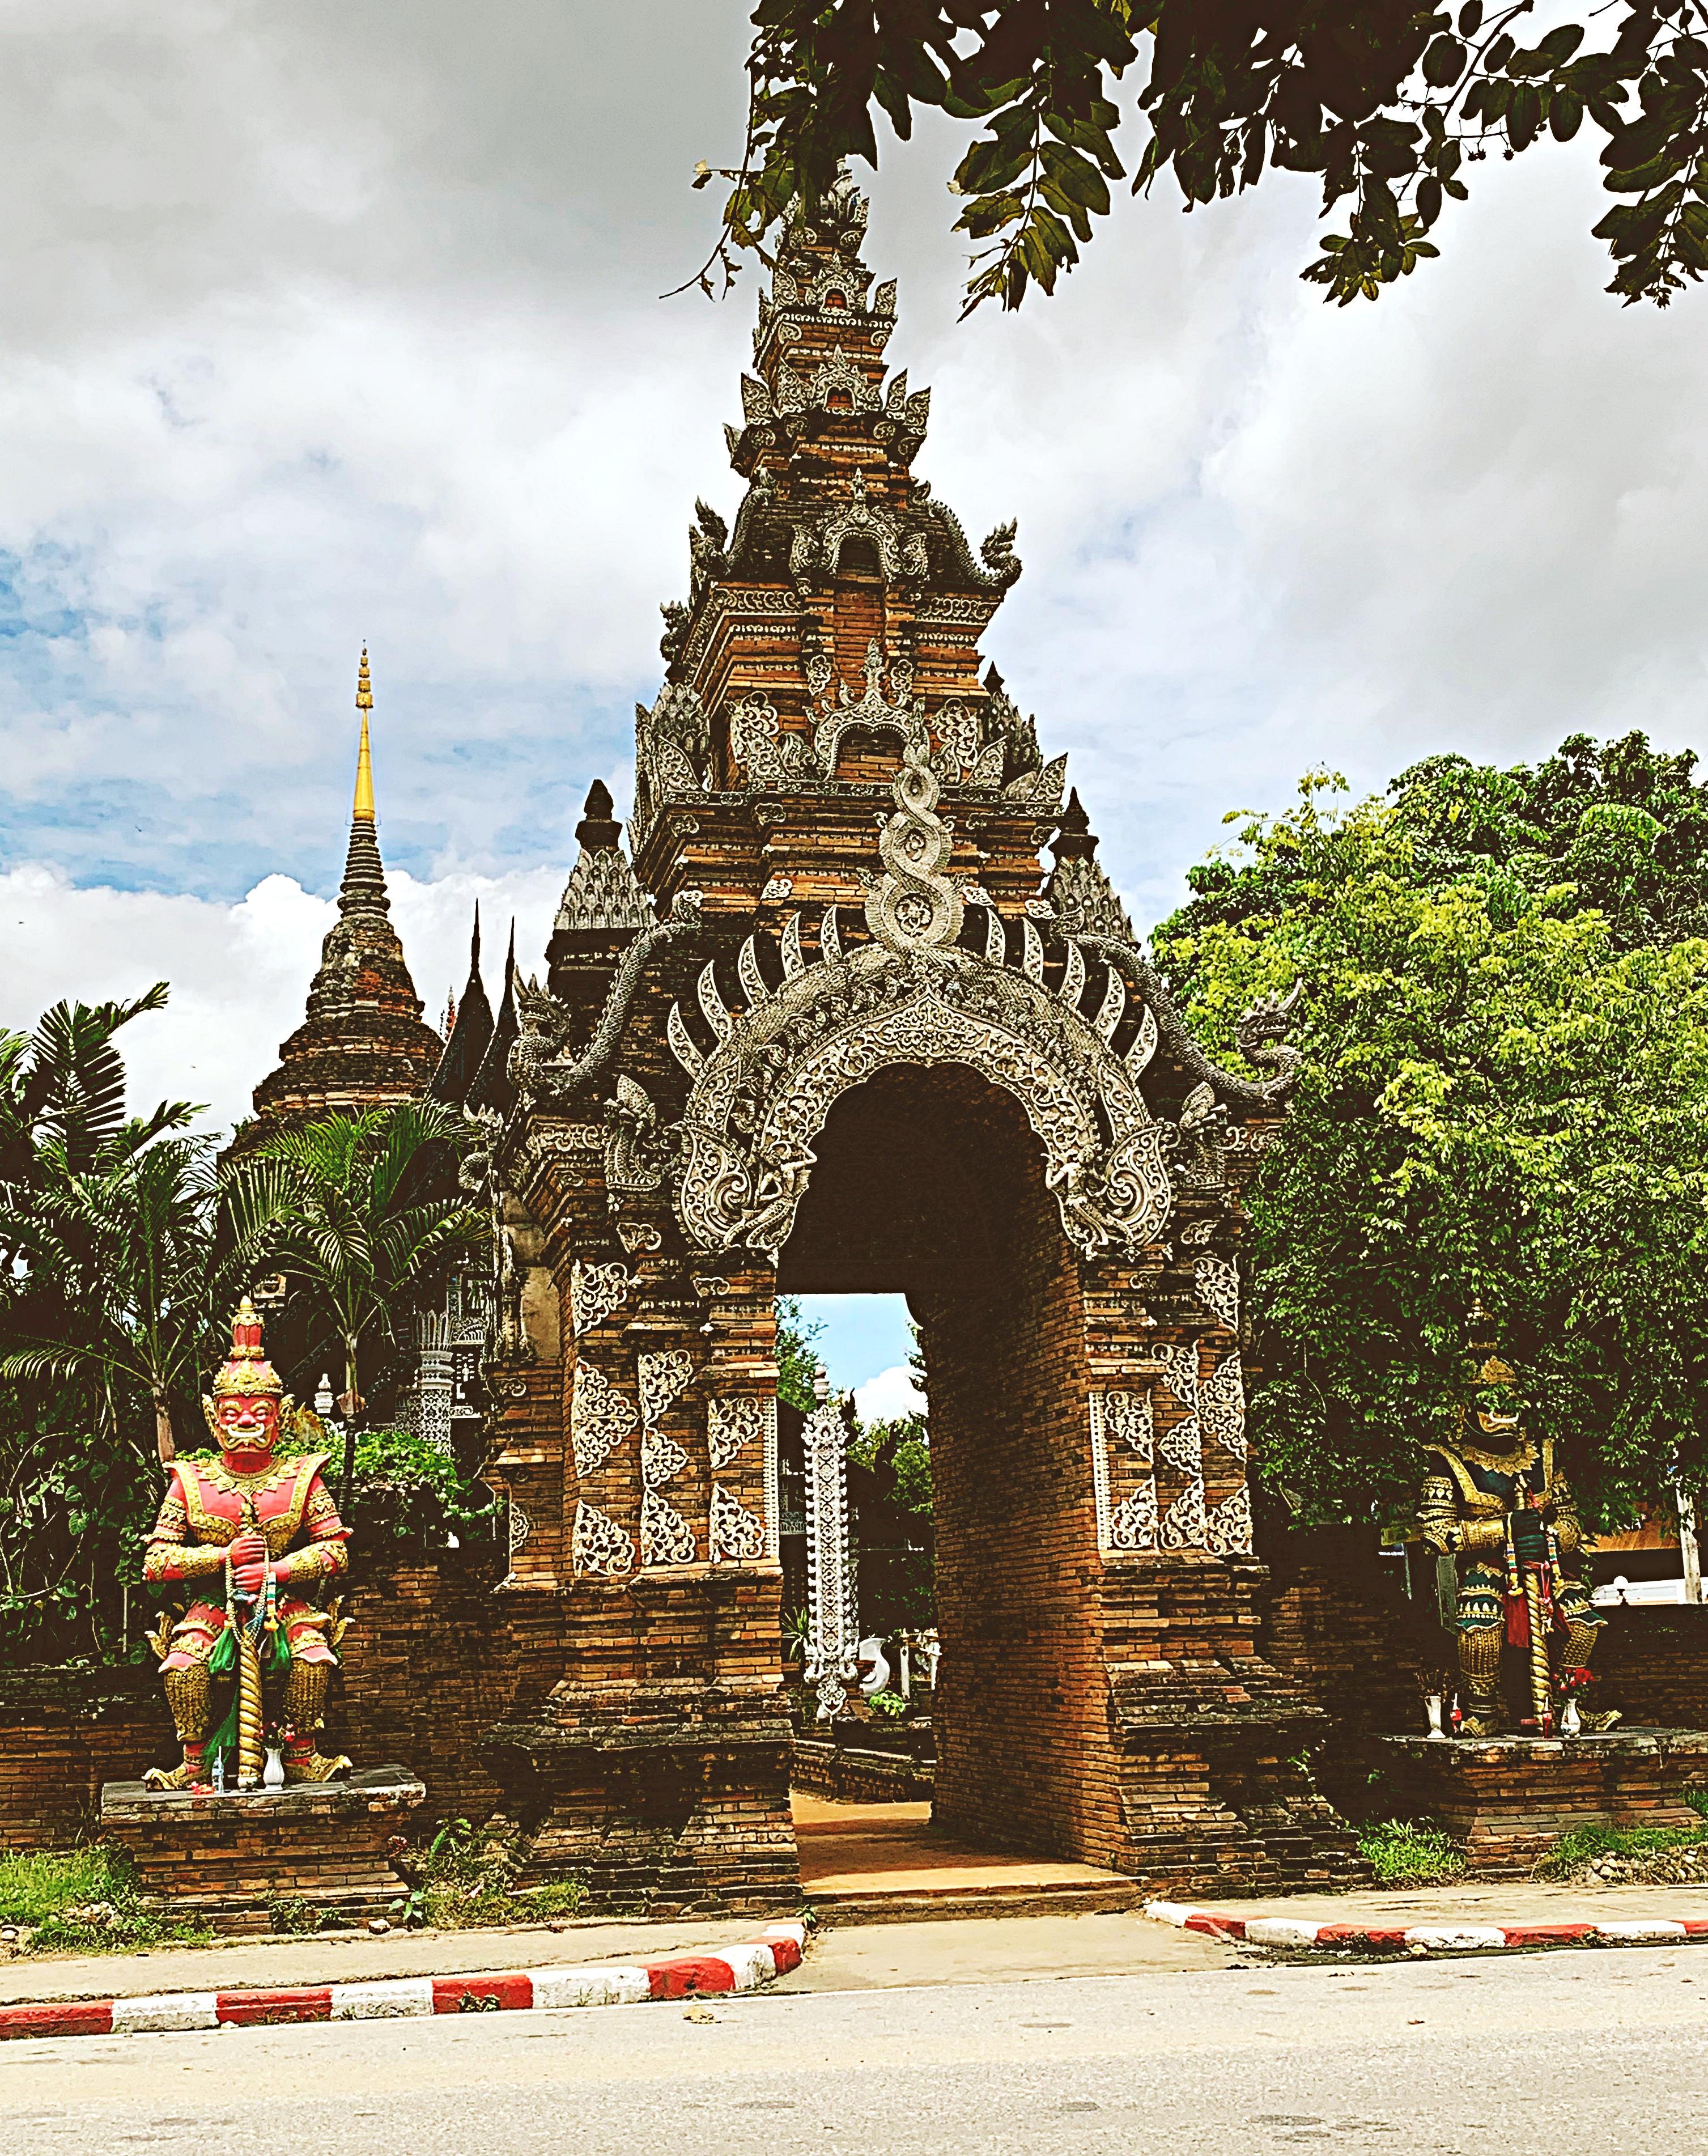 ChiangMaiWatLokMoliEntrance19